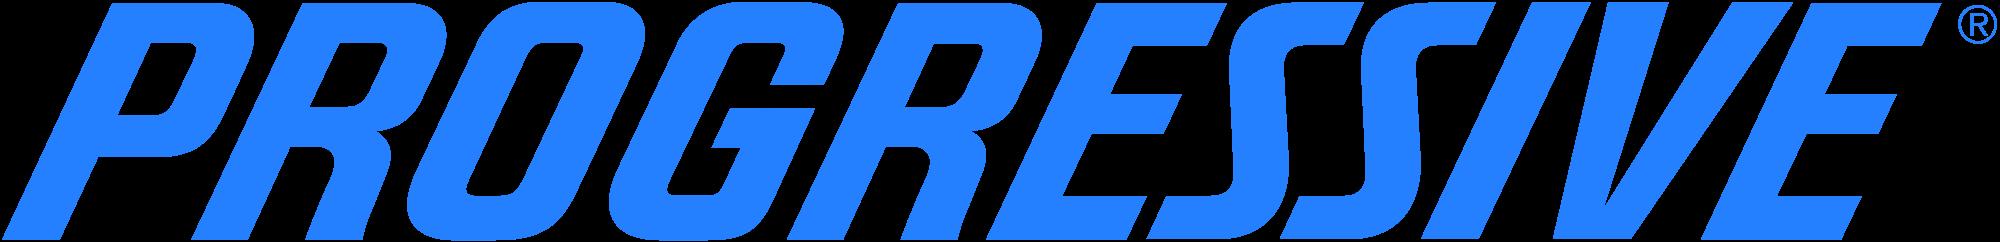 Progressive logo download free clip art with a transparent.